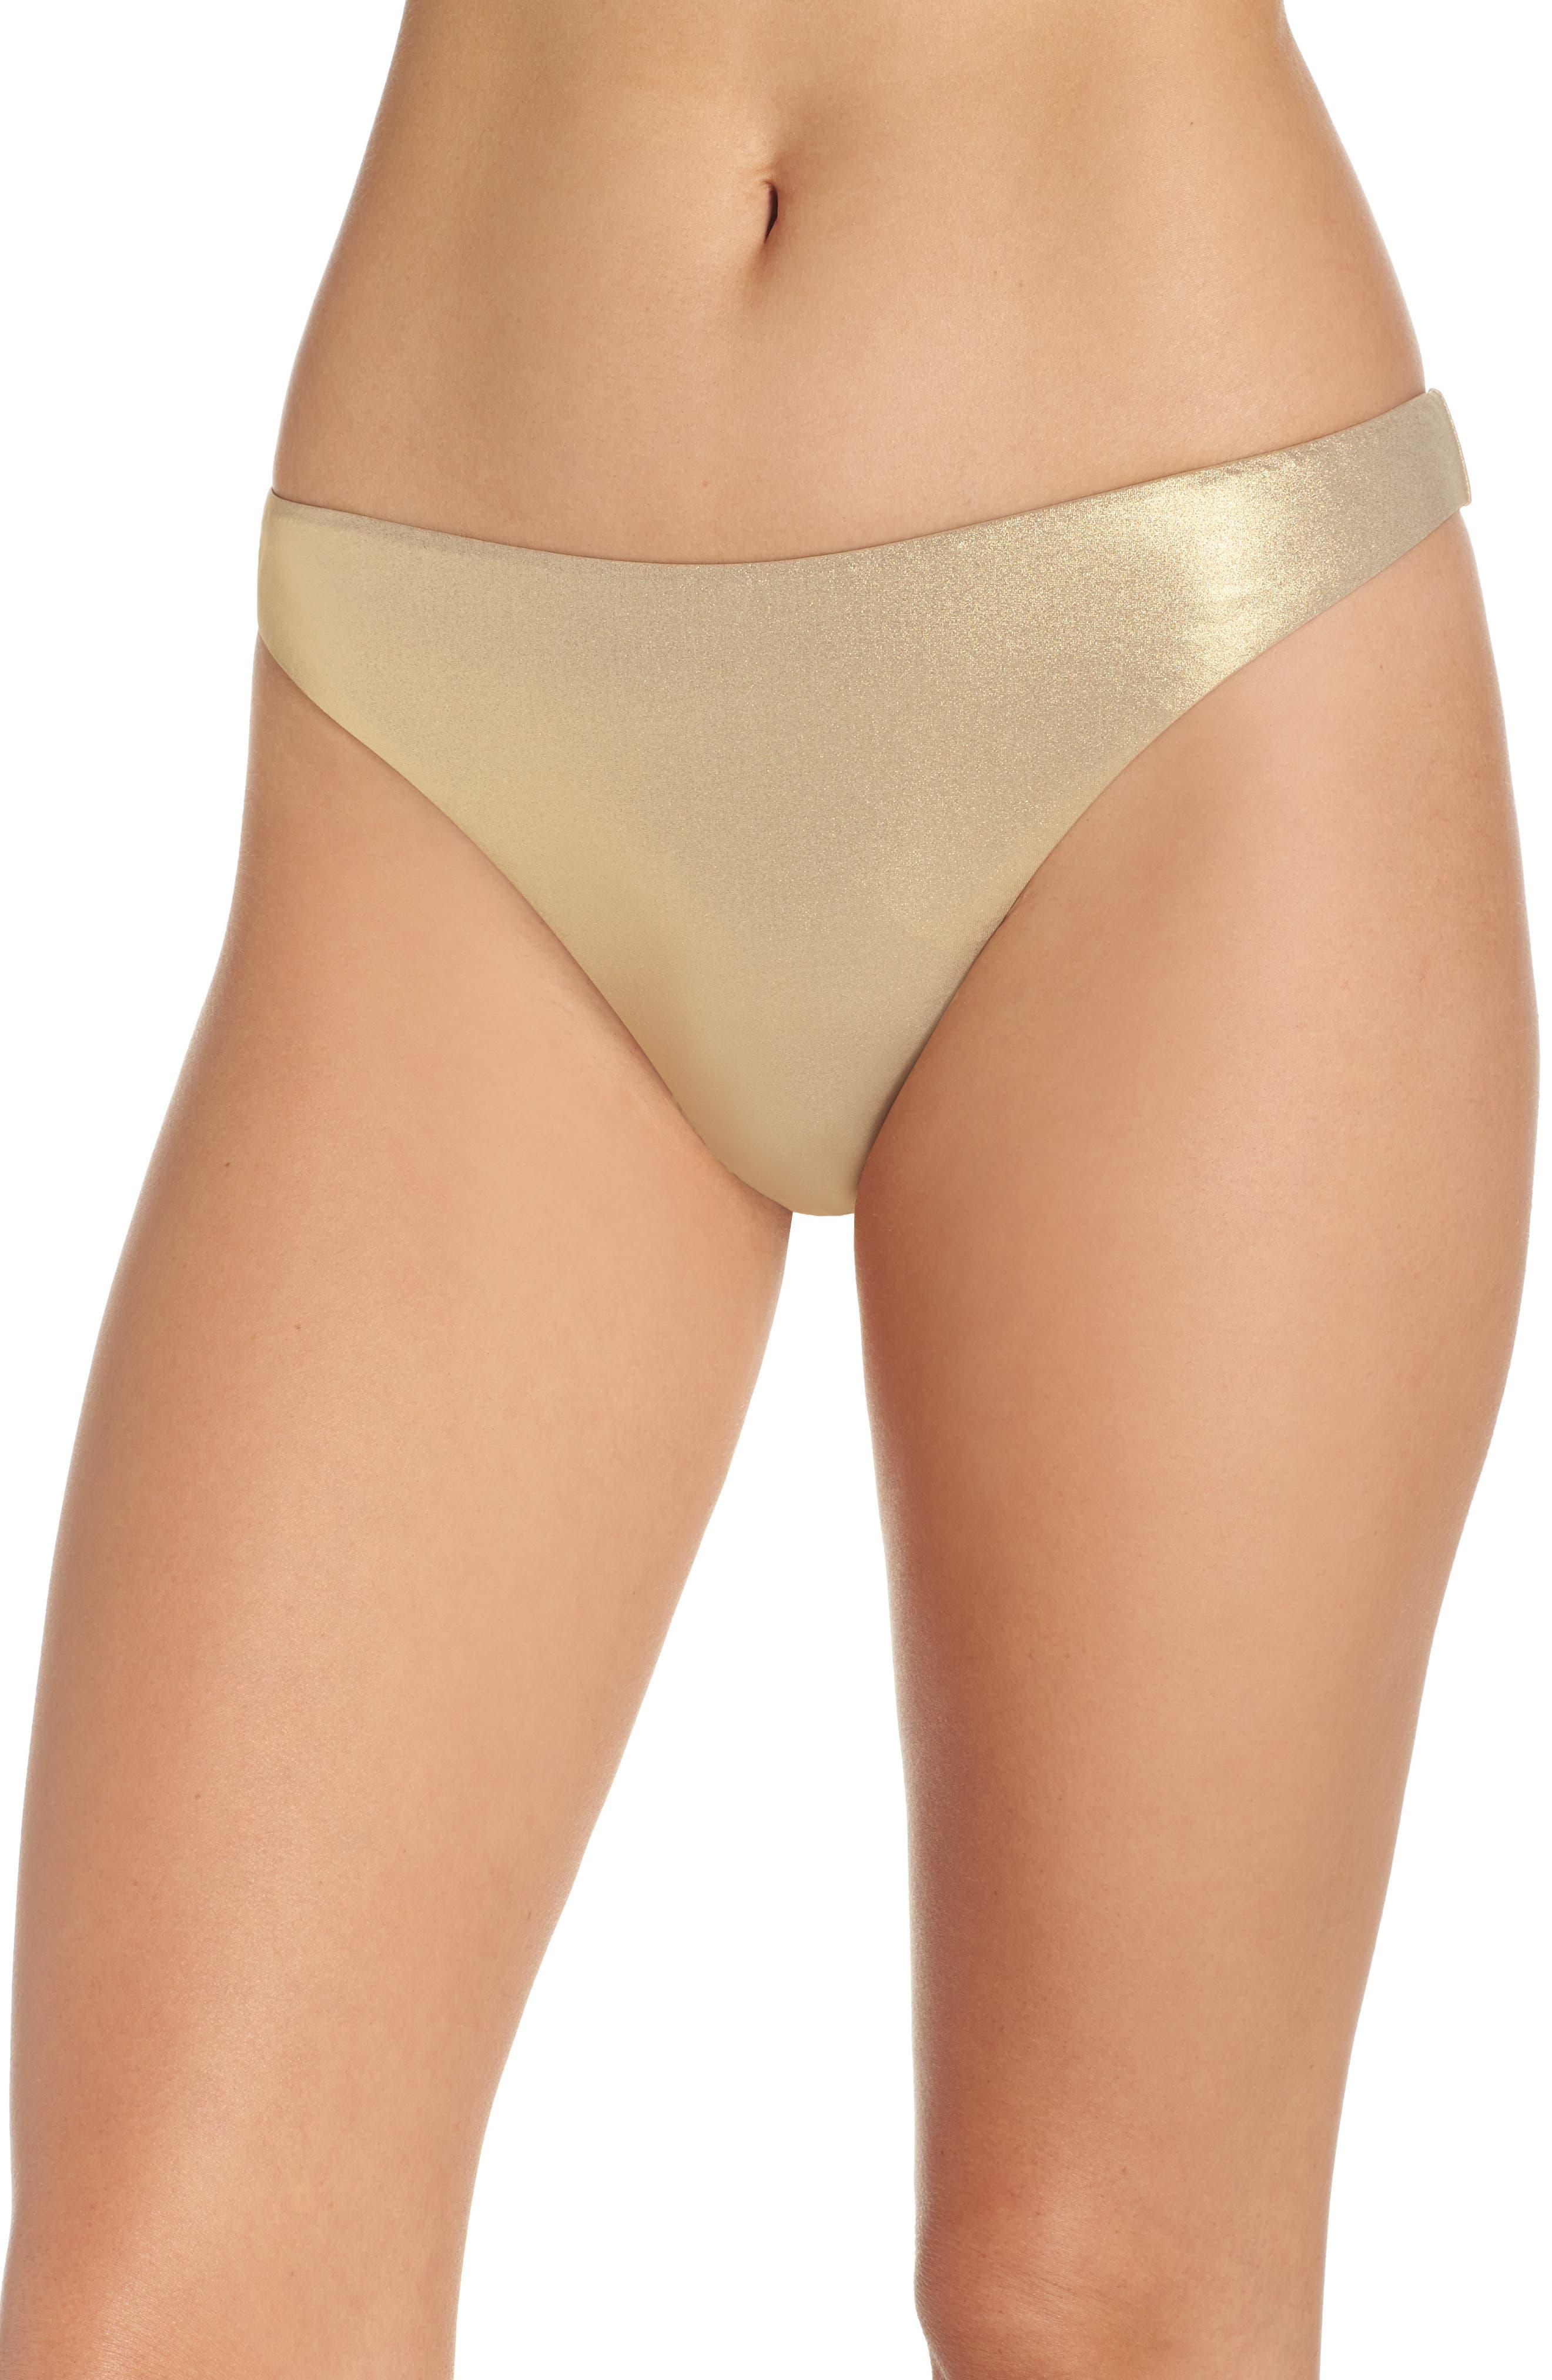 Golden Medallion Bikini Bottoms,                             Main thumbnail 1, color,                             710